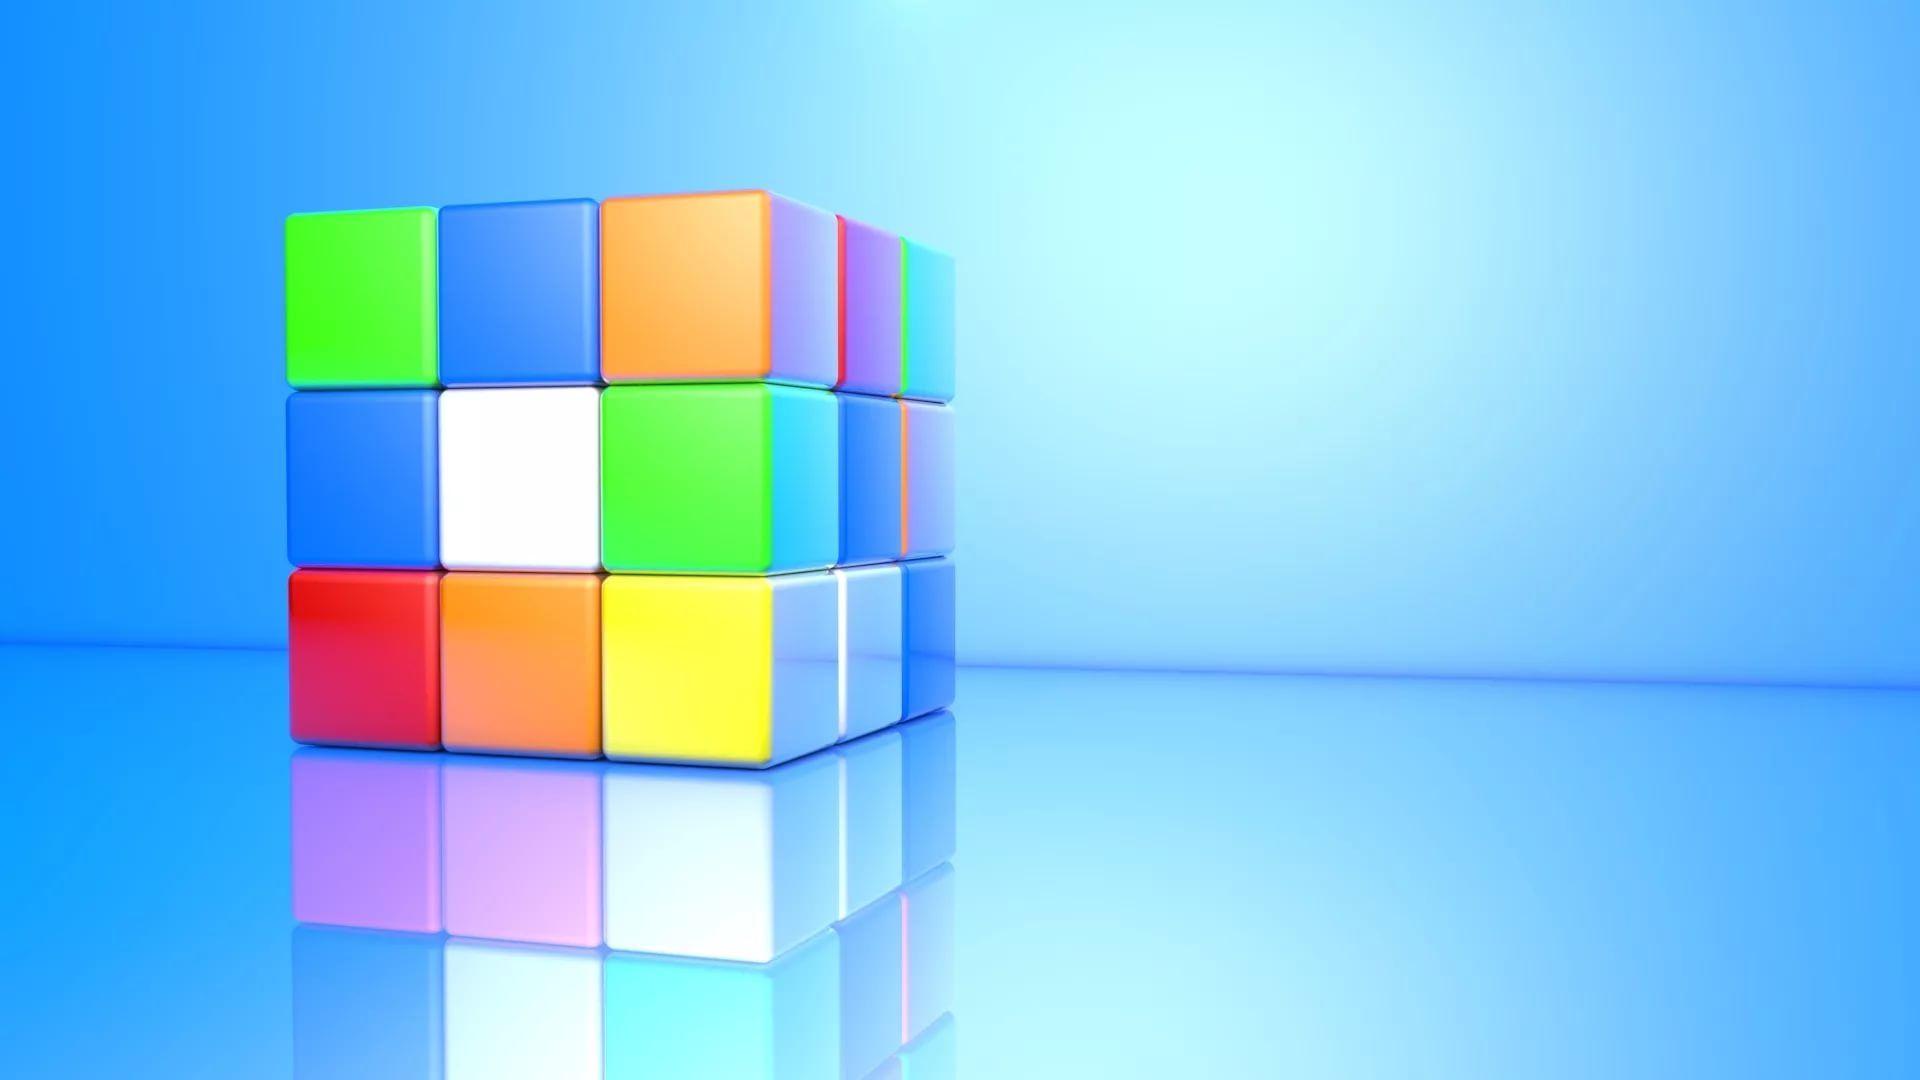 Rubiks Cube wallpaper download